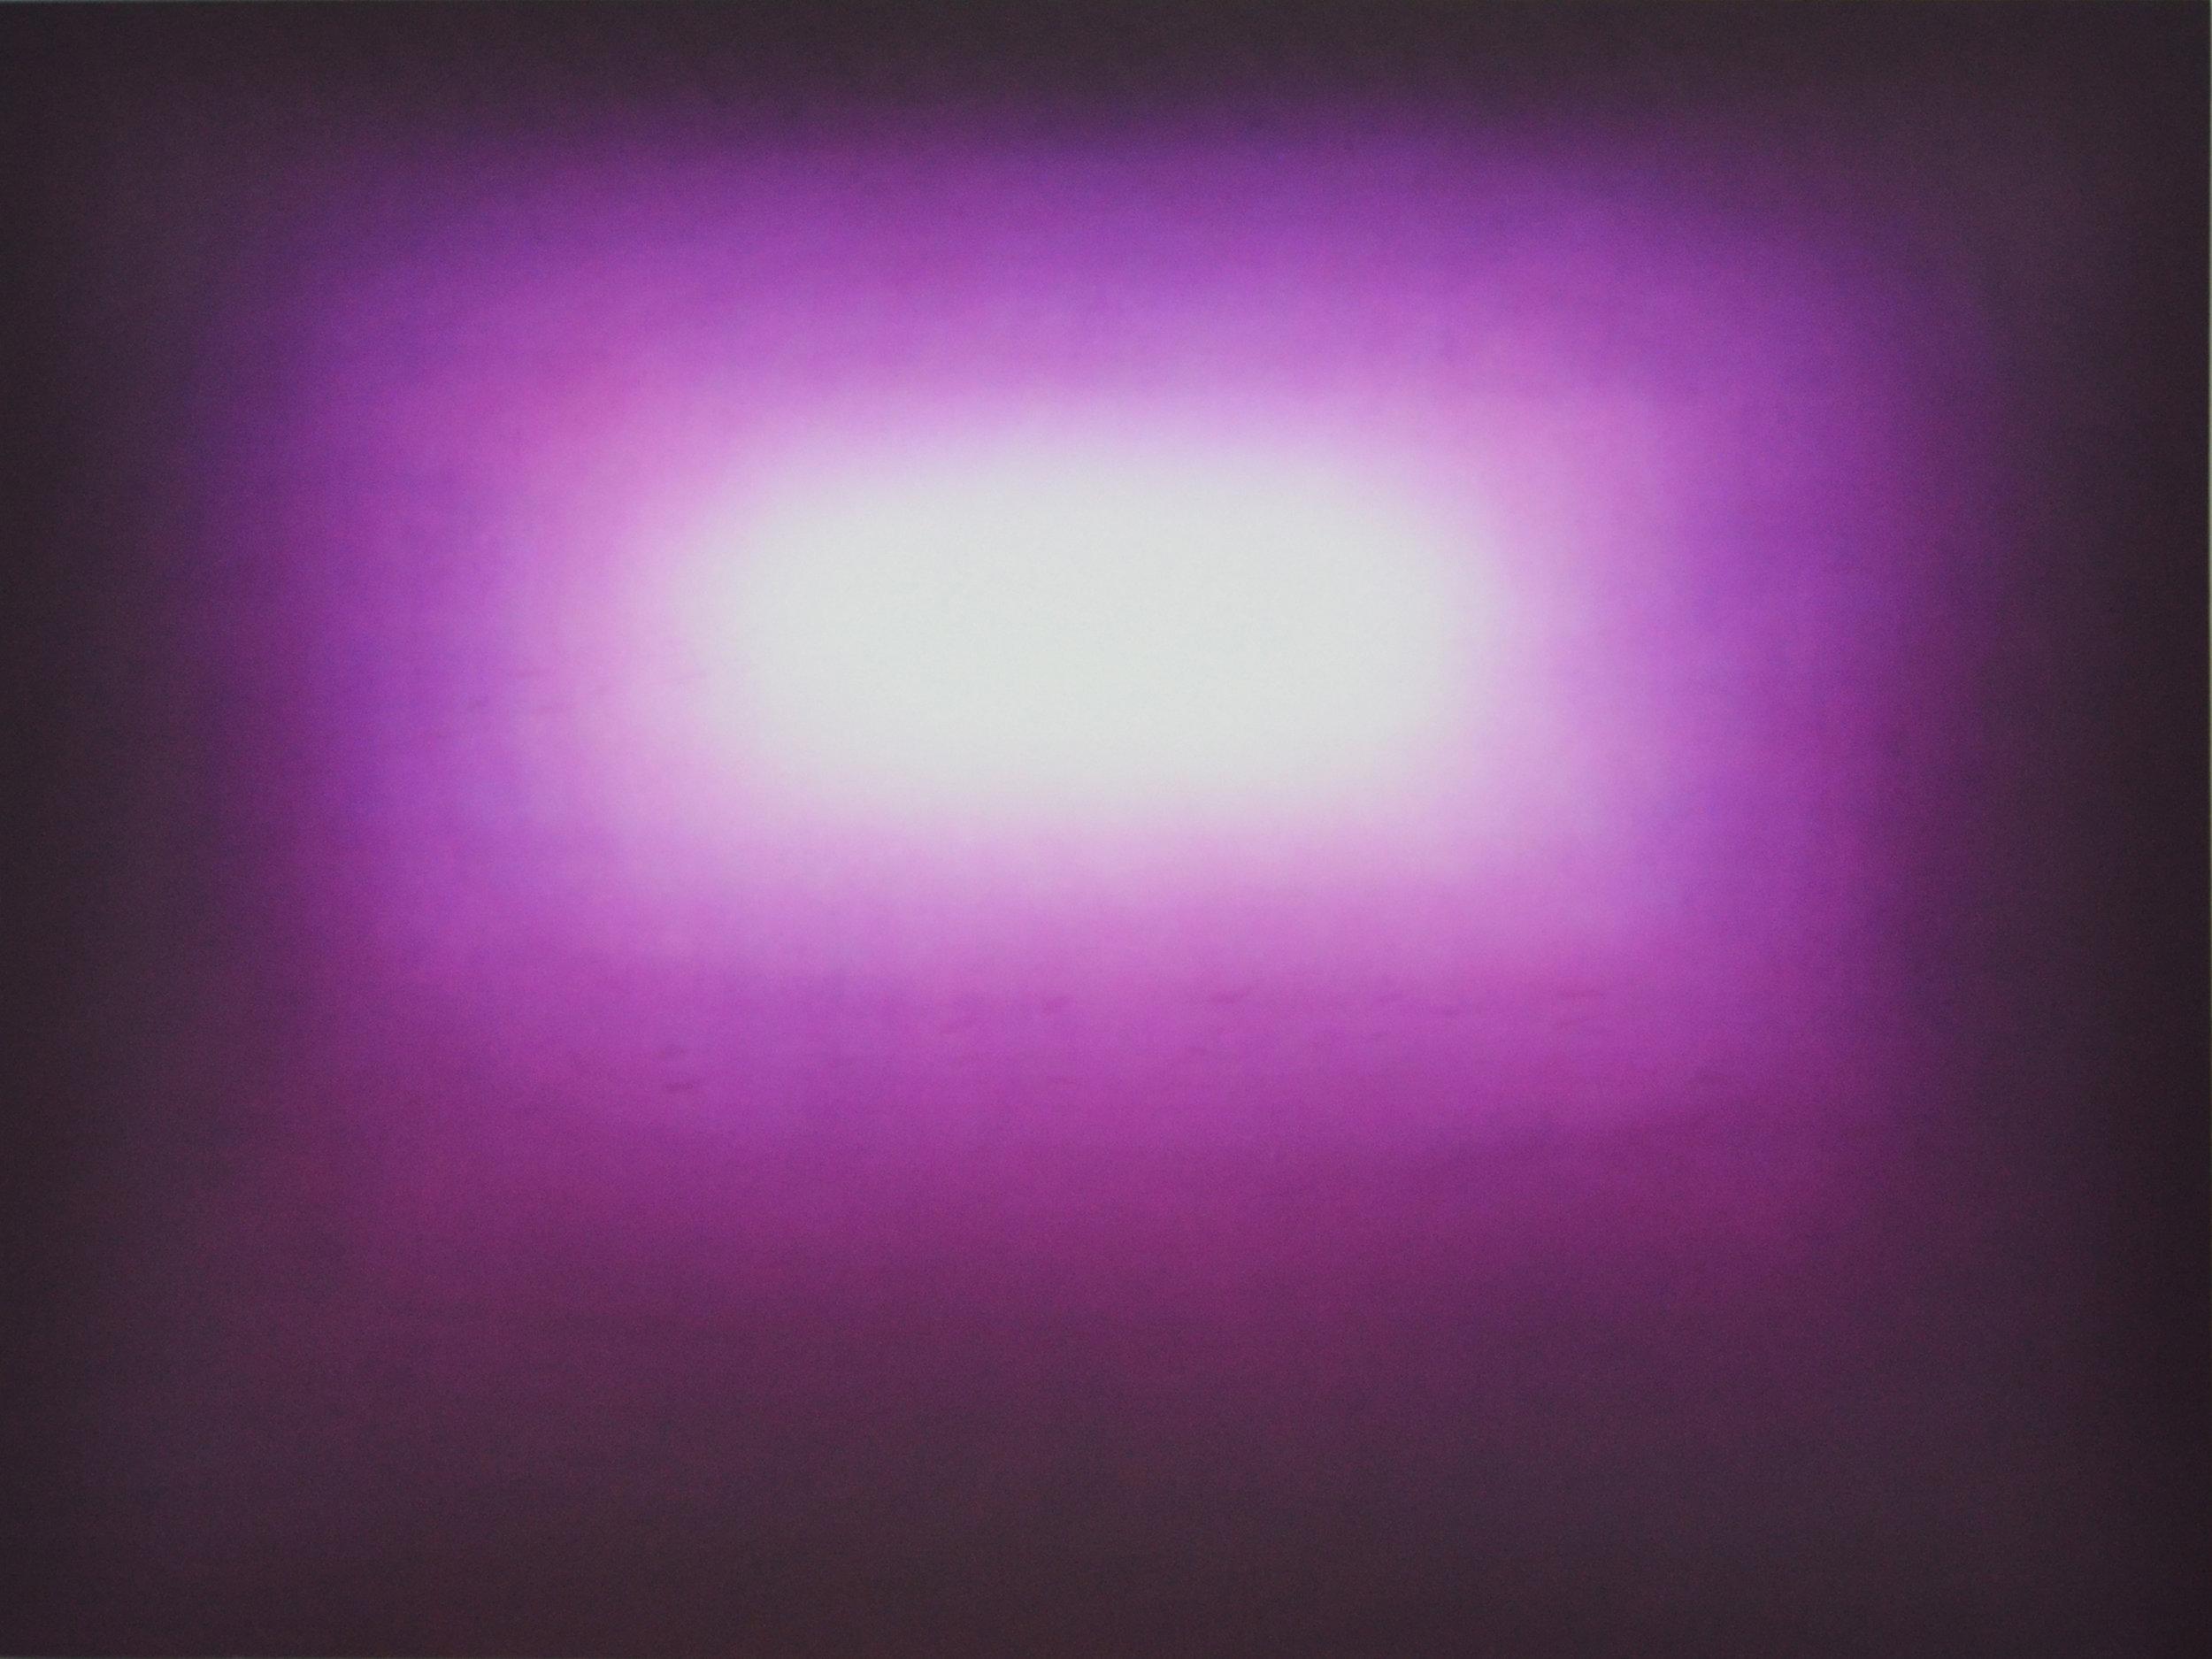 E2012-13_0206.JPG